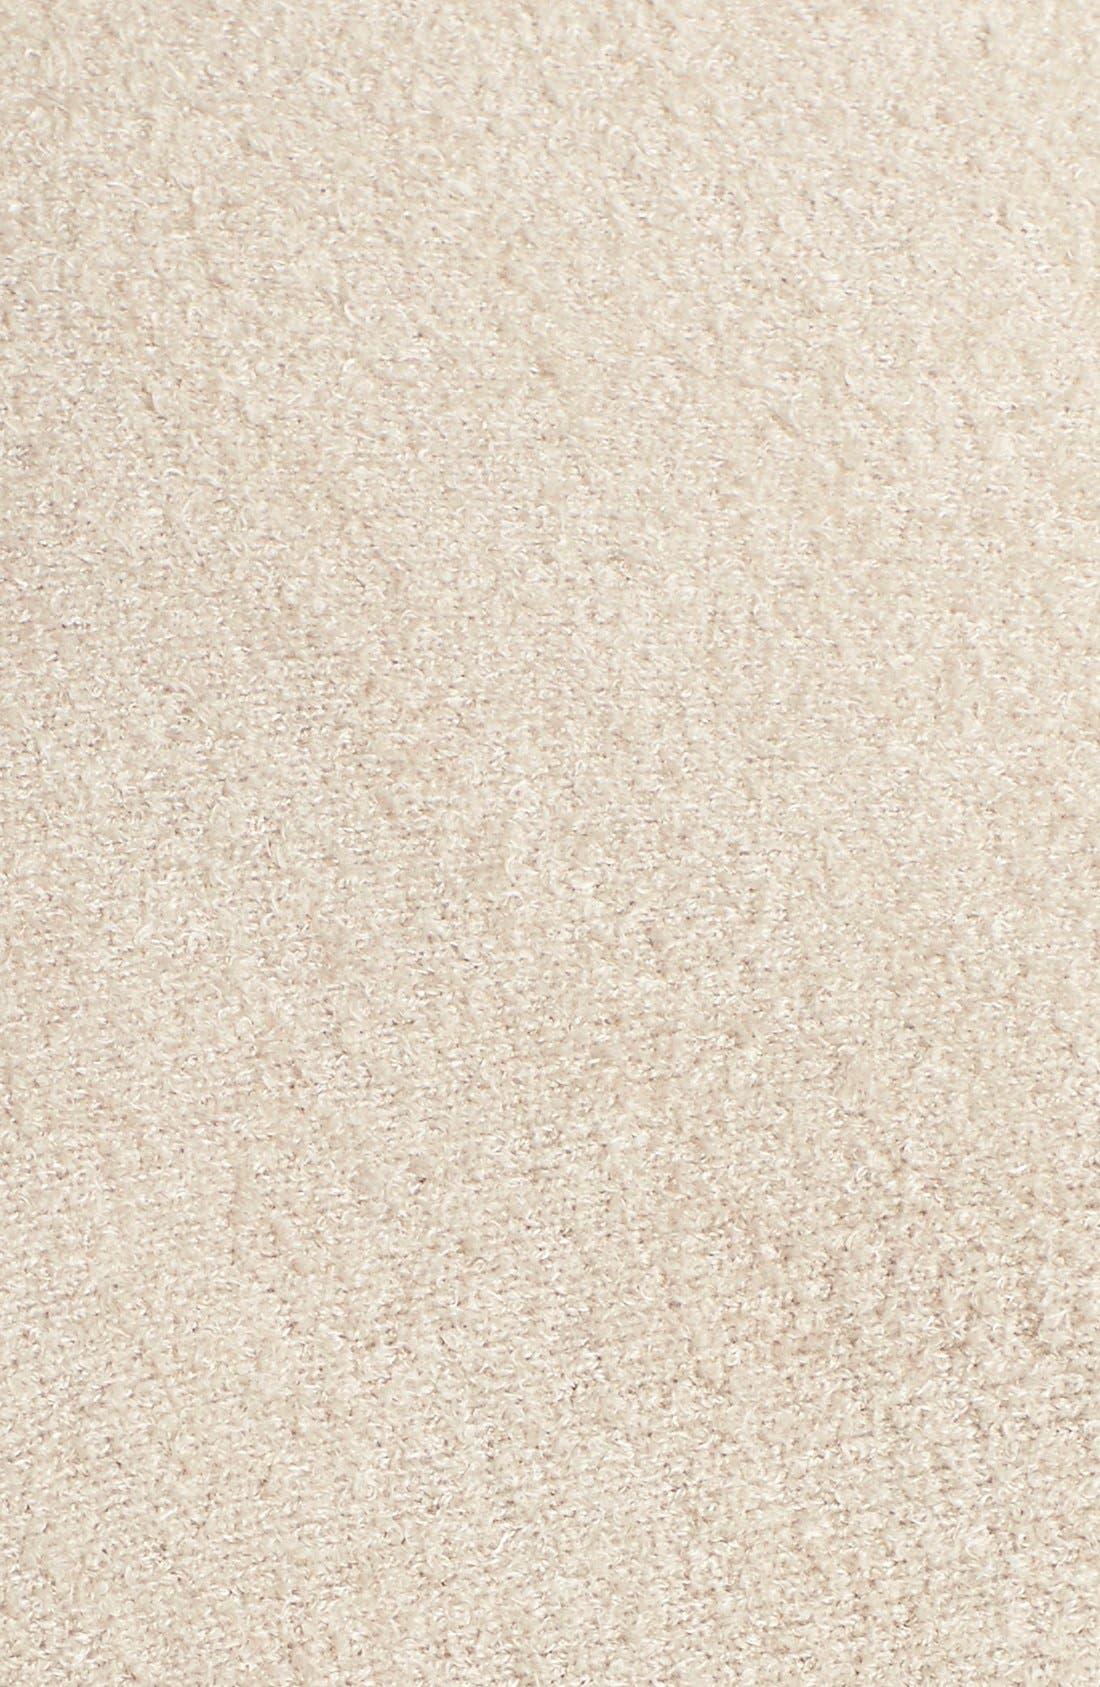 CozyChic Lite<sup>®</sup> Ruana,                             Alternate thumbnail 5, color,                             Sand